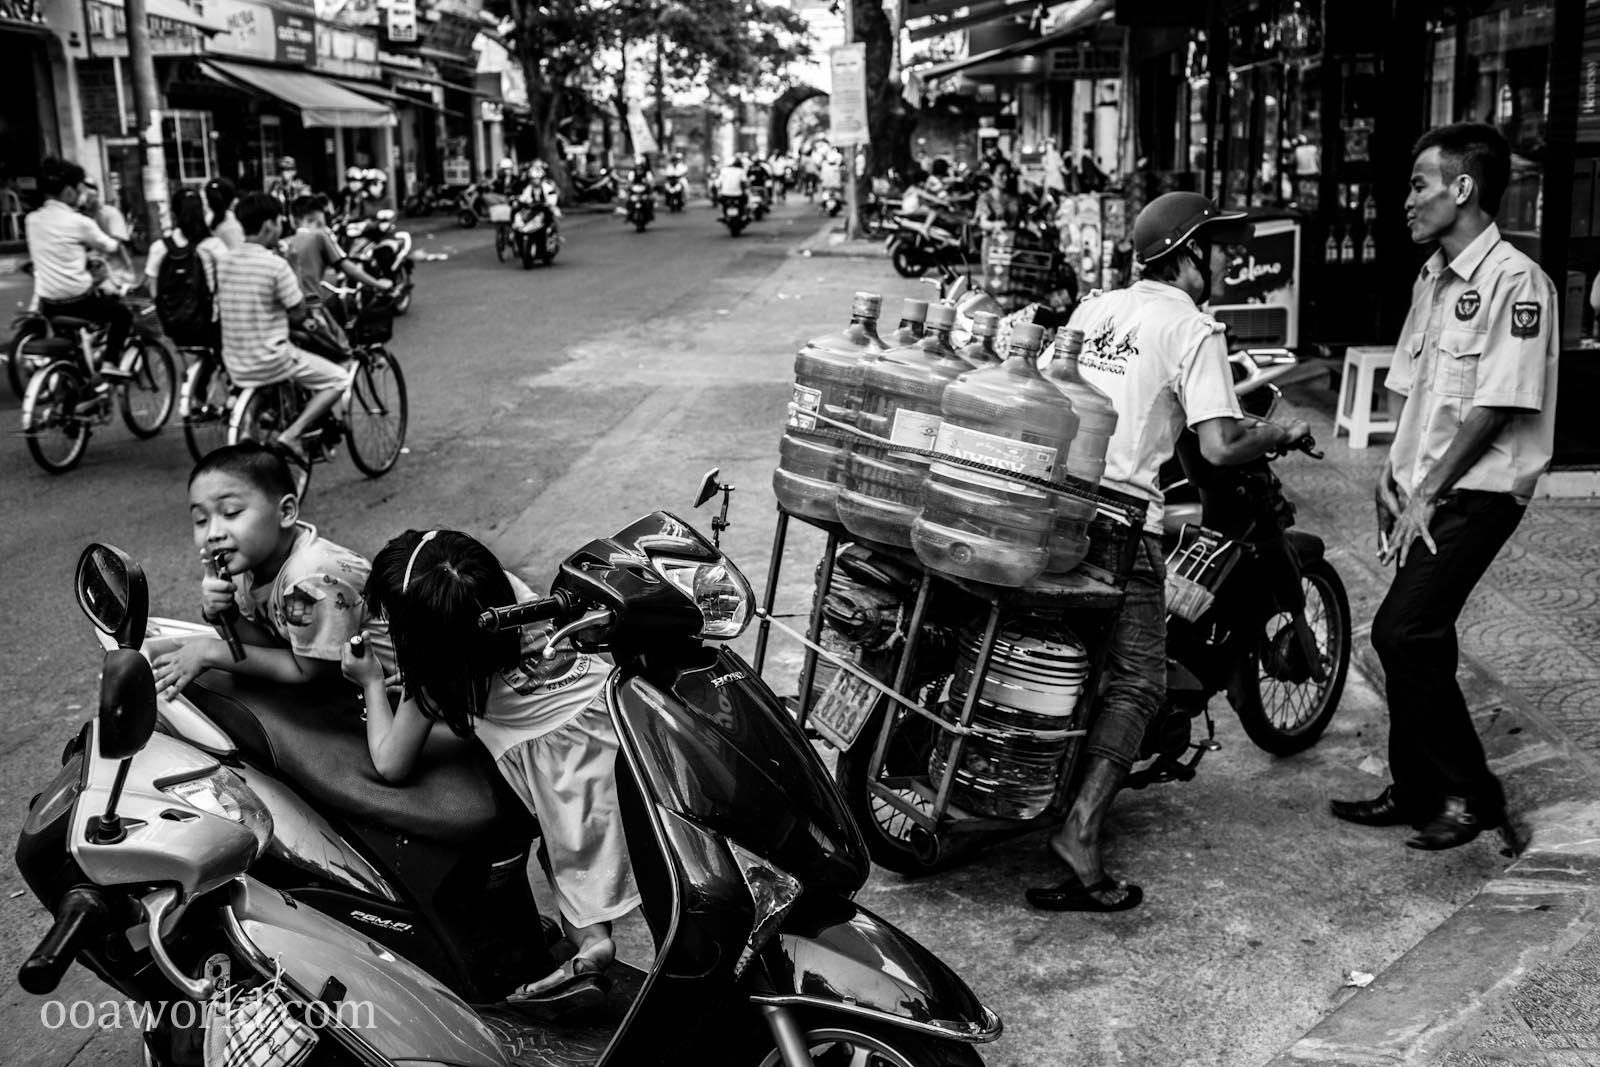 Hue Vietnam Street Photography Photo Ooaworld